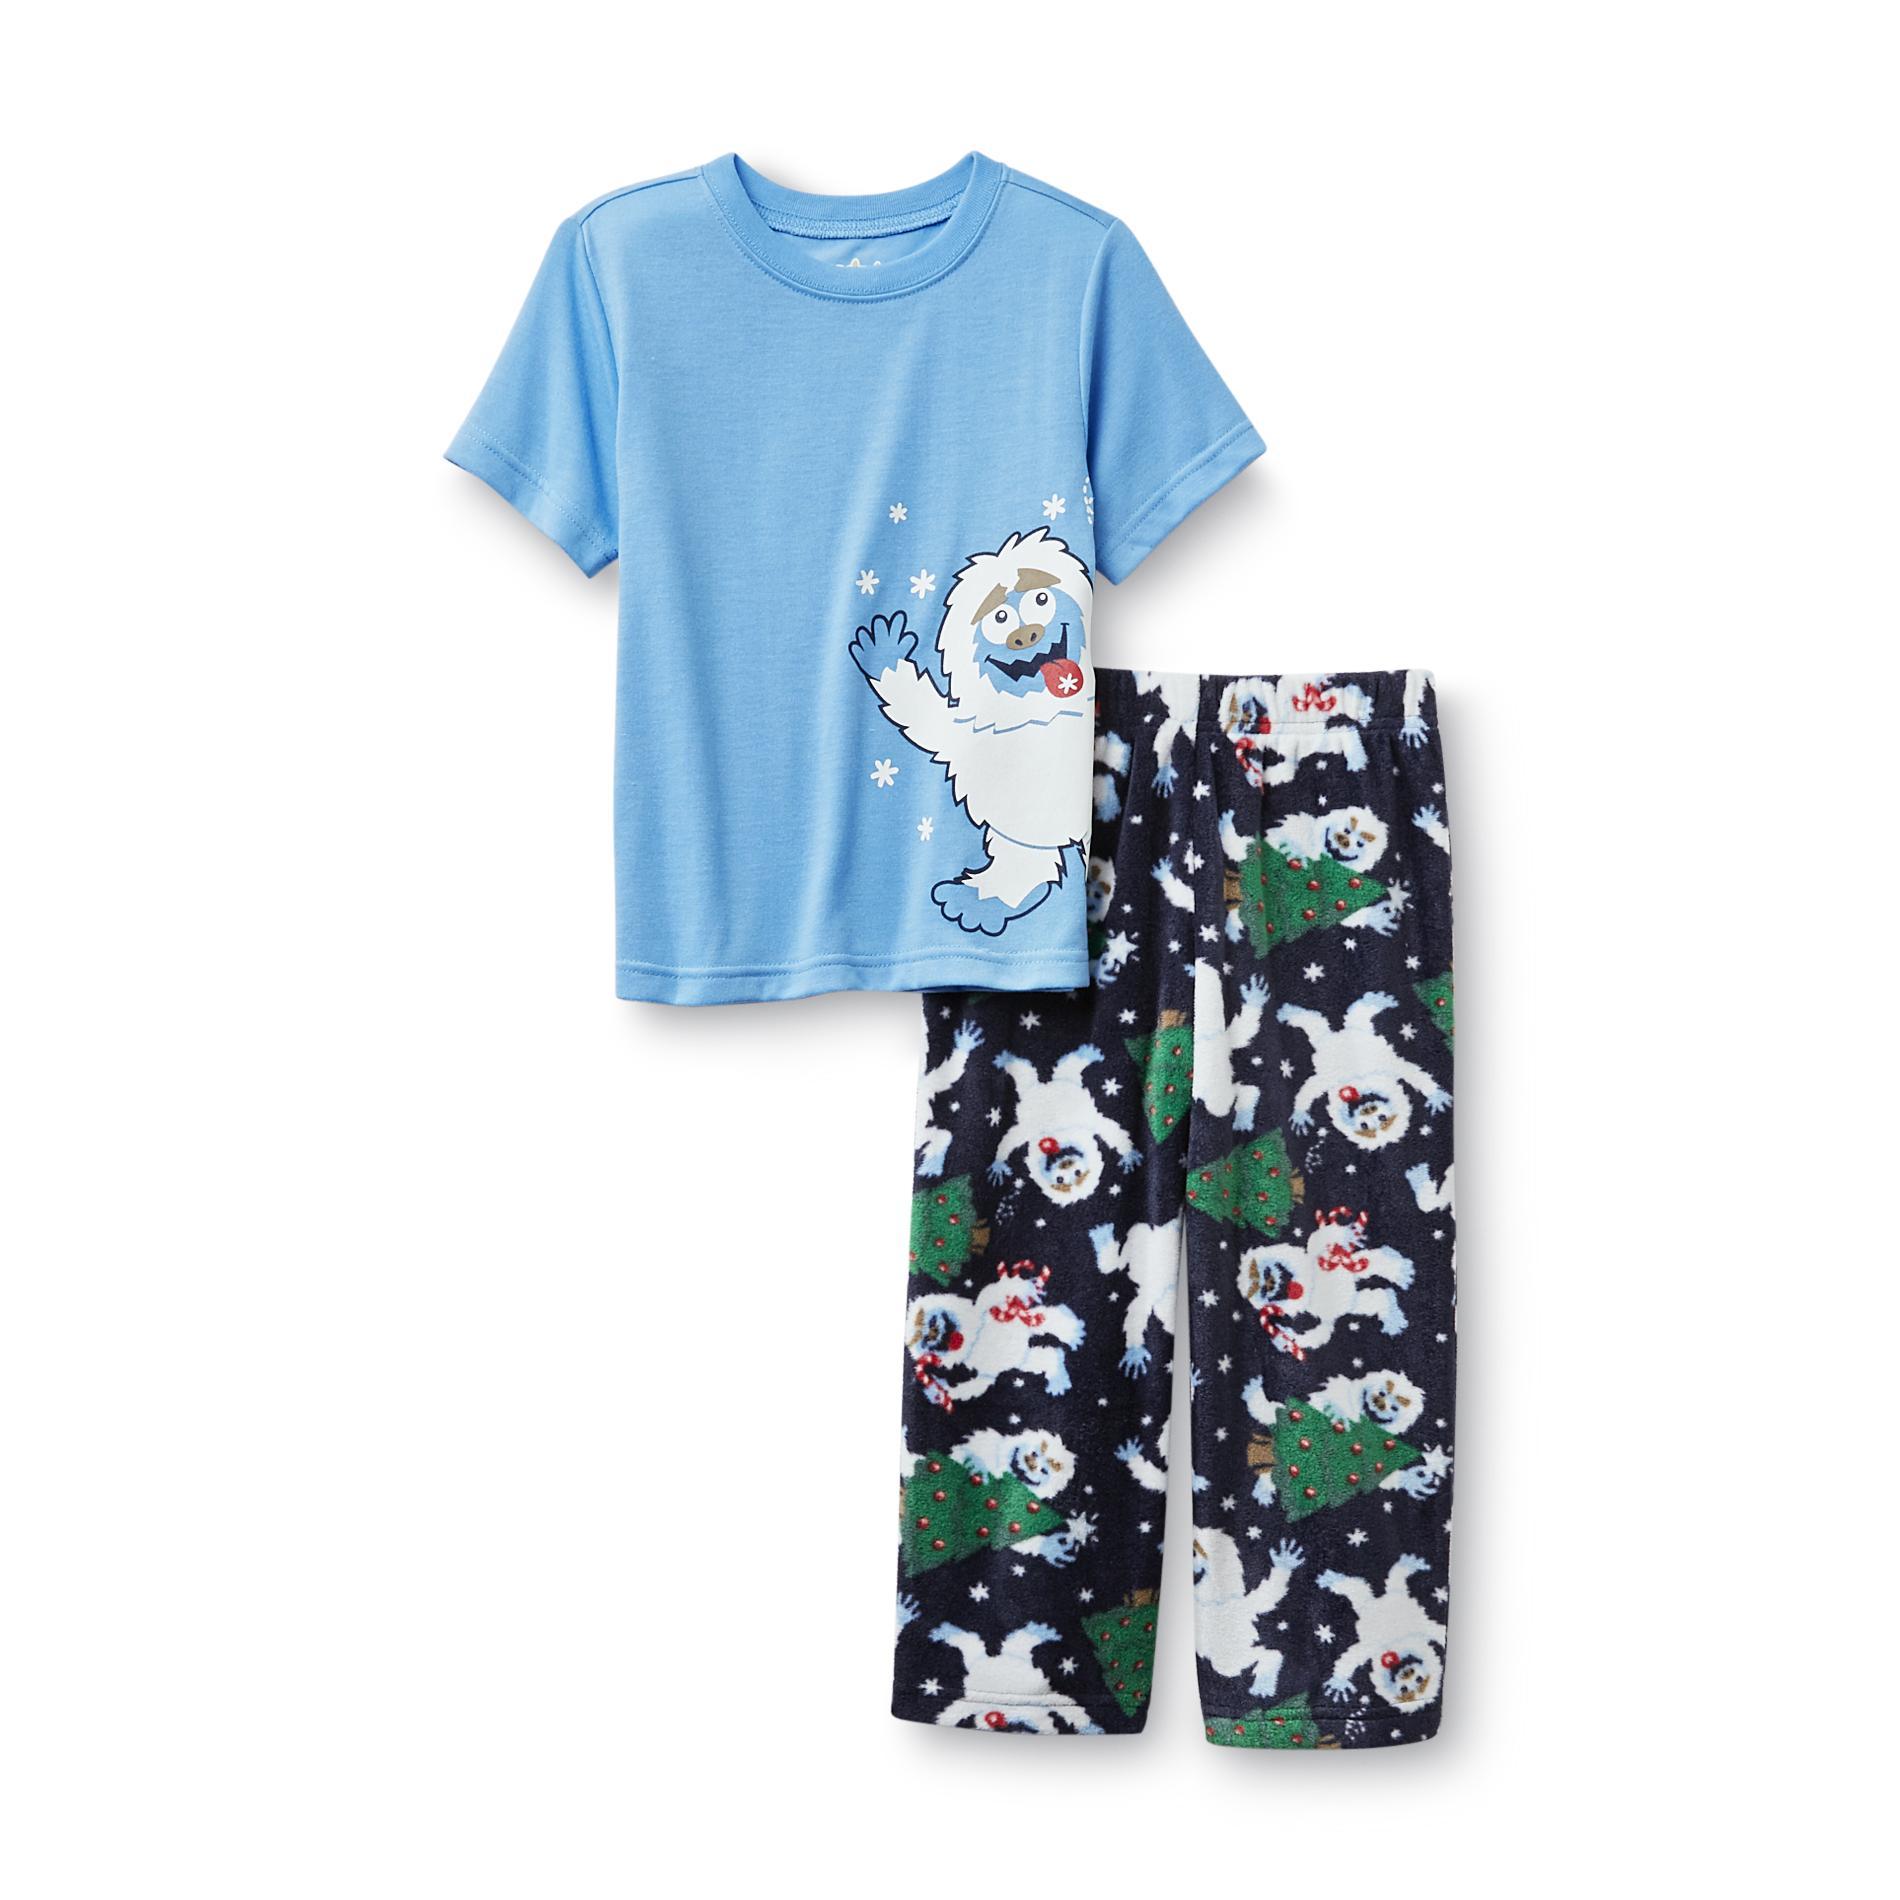 Joe Boxer Infant & Toddler Boy' Pajama Shirt Pants